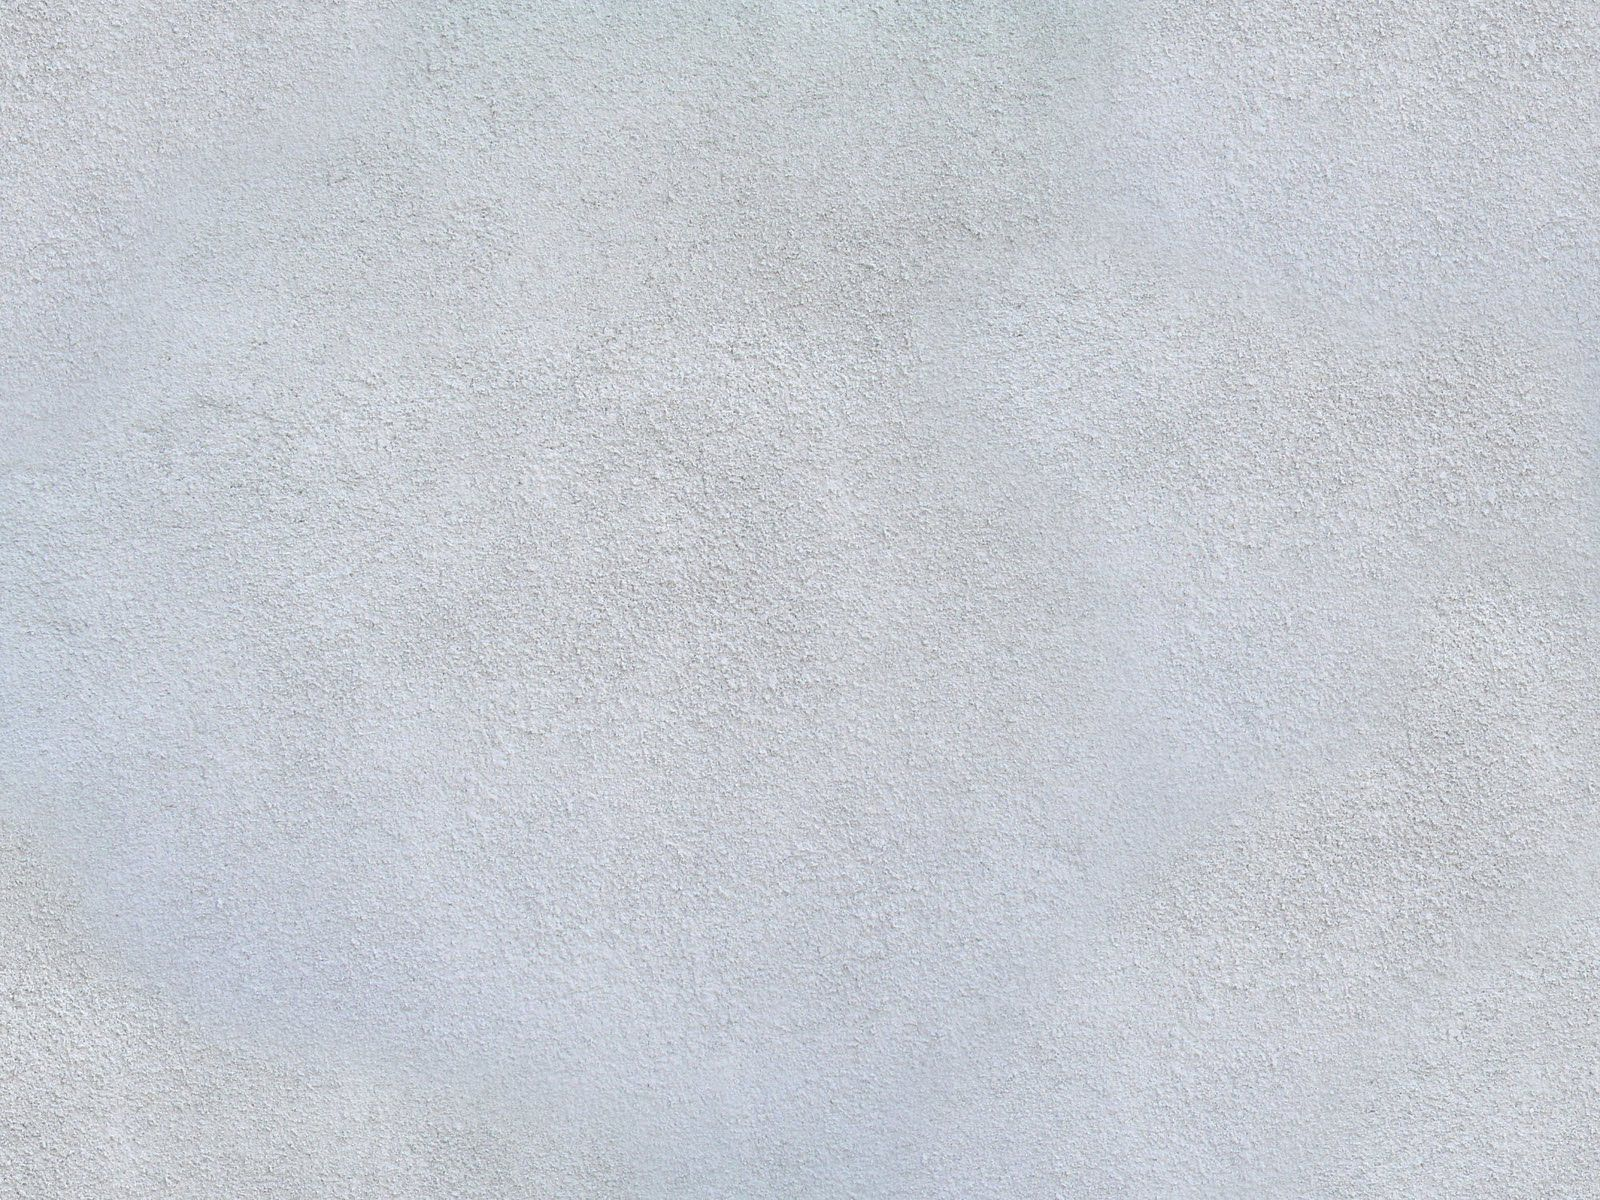 polished concrete floor texture seamless. White Concrete Texture - Google Search Polished Floor Seamless